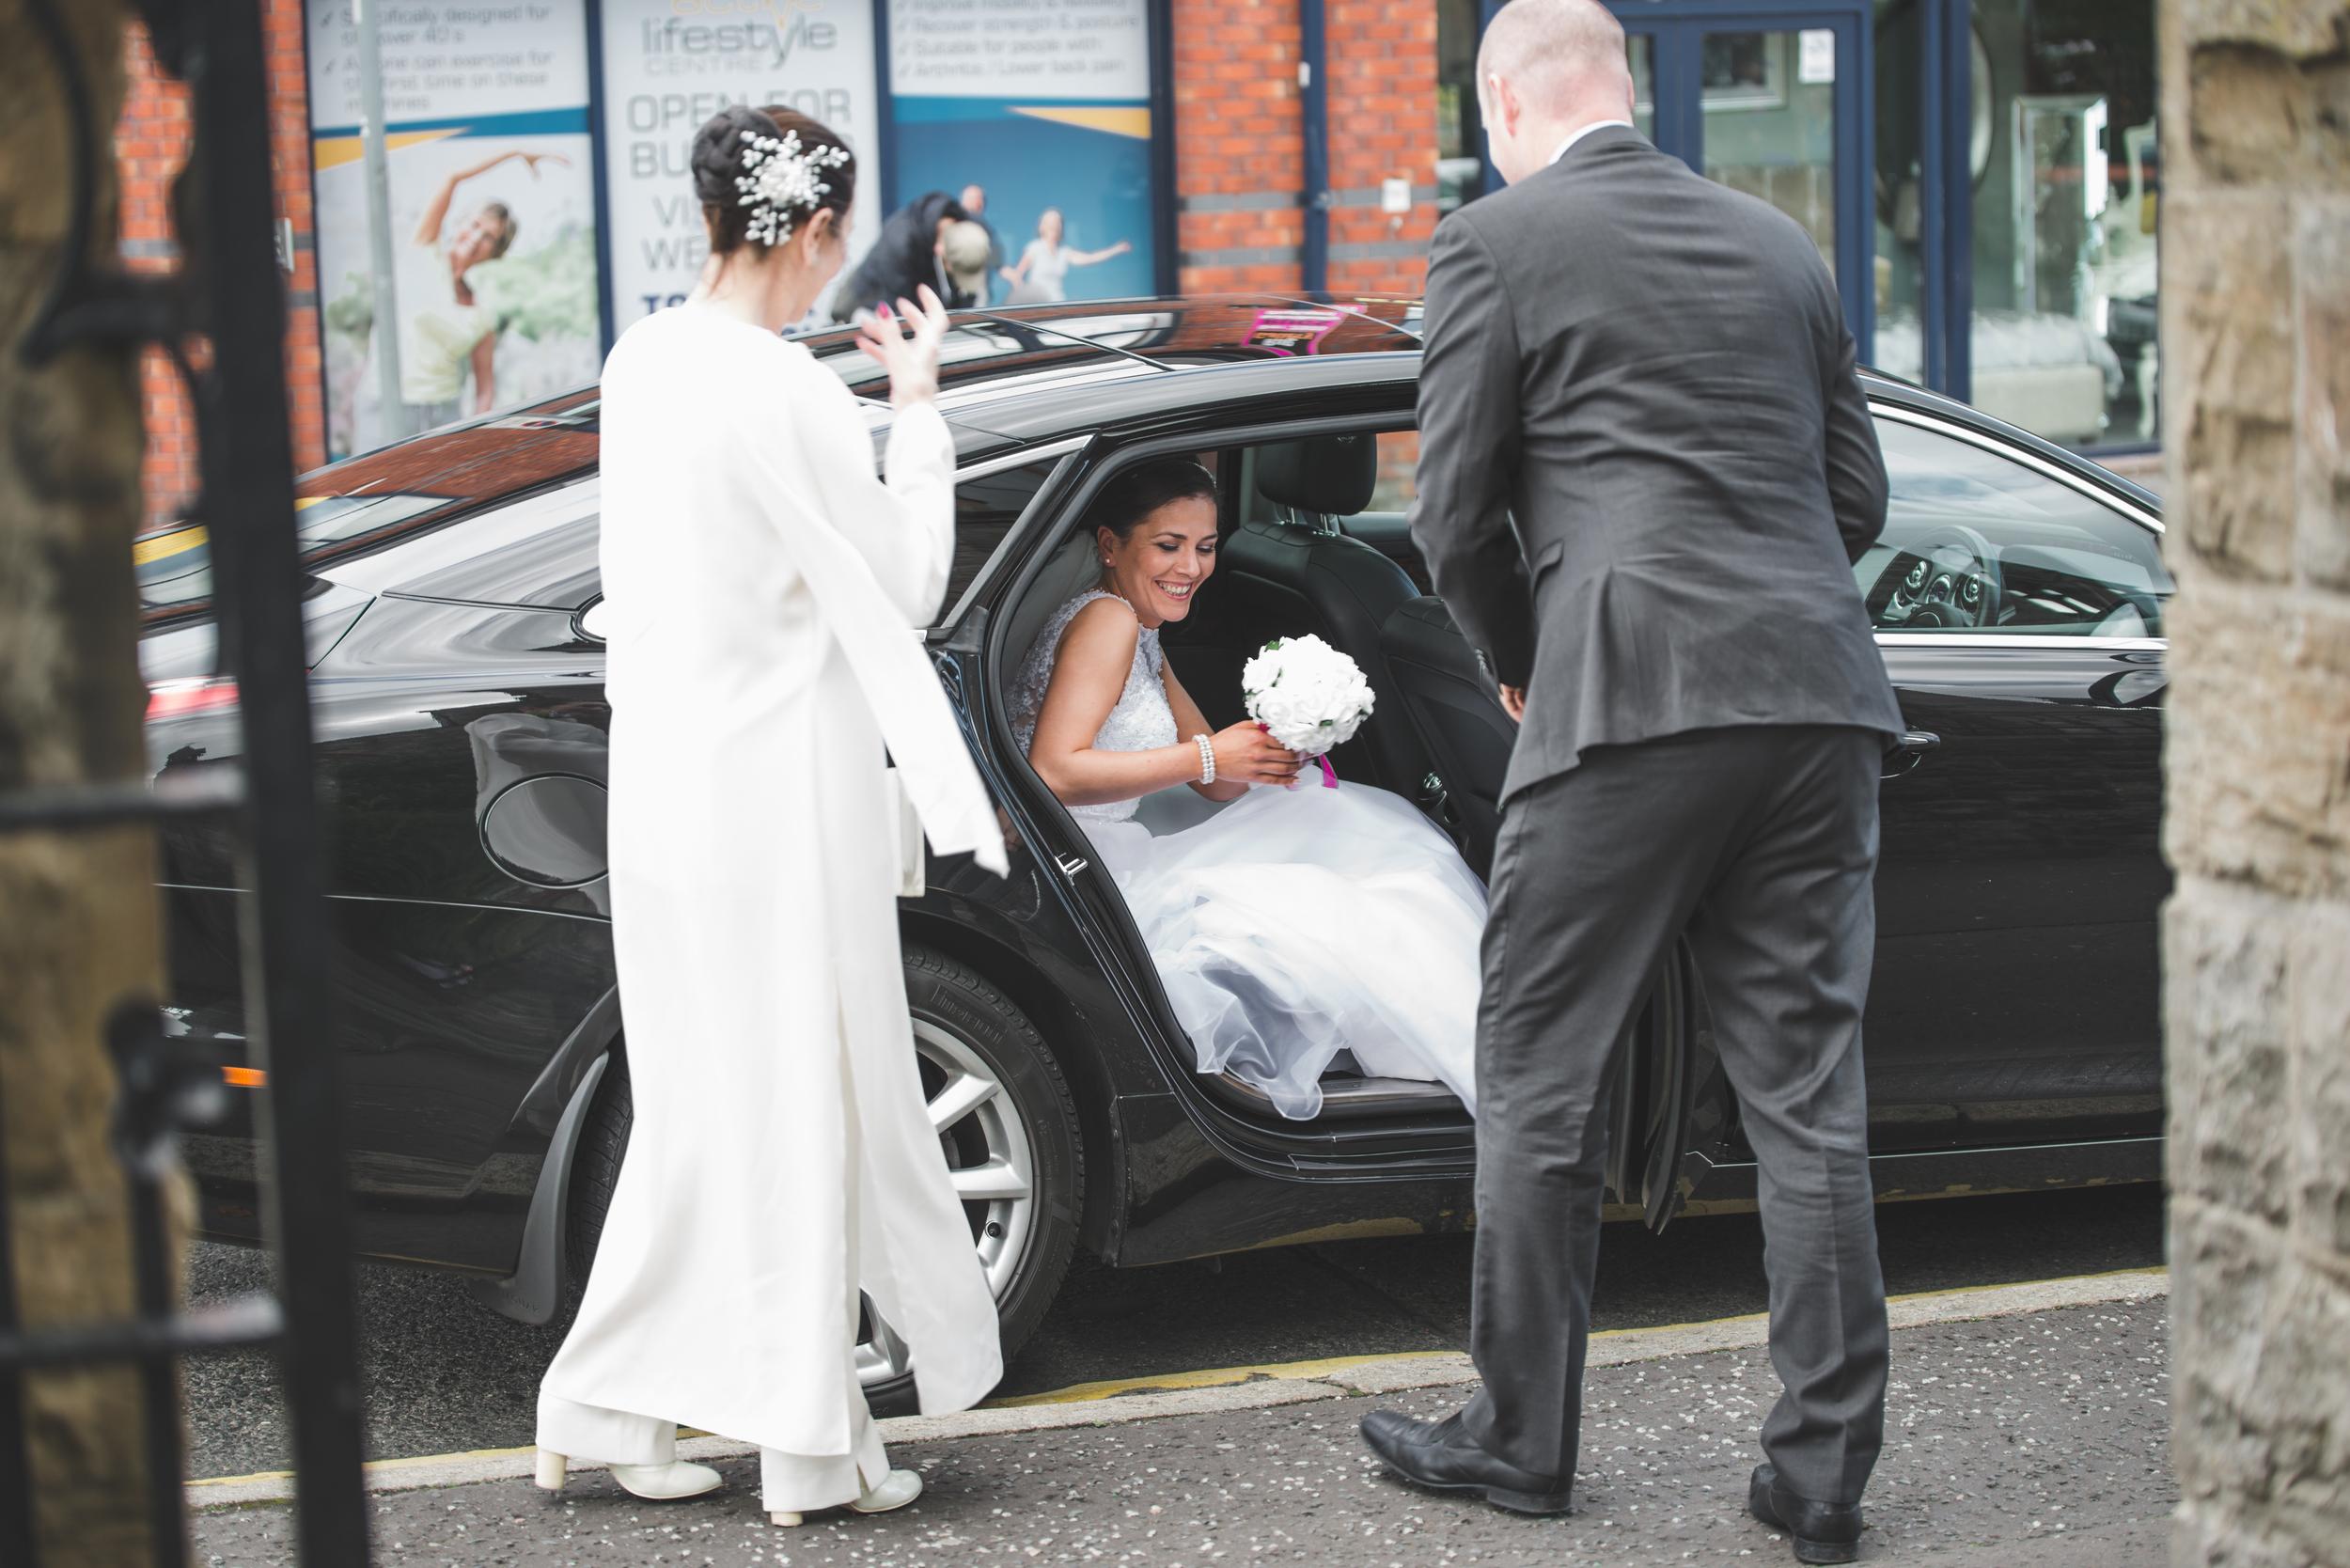 Lisburn_Wedding_Photographer_Purephotoni_St_Patricks_Bride_Car